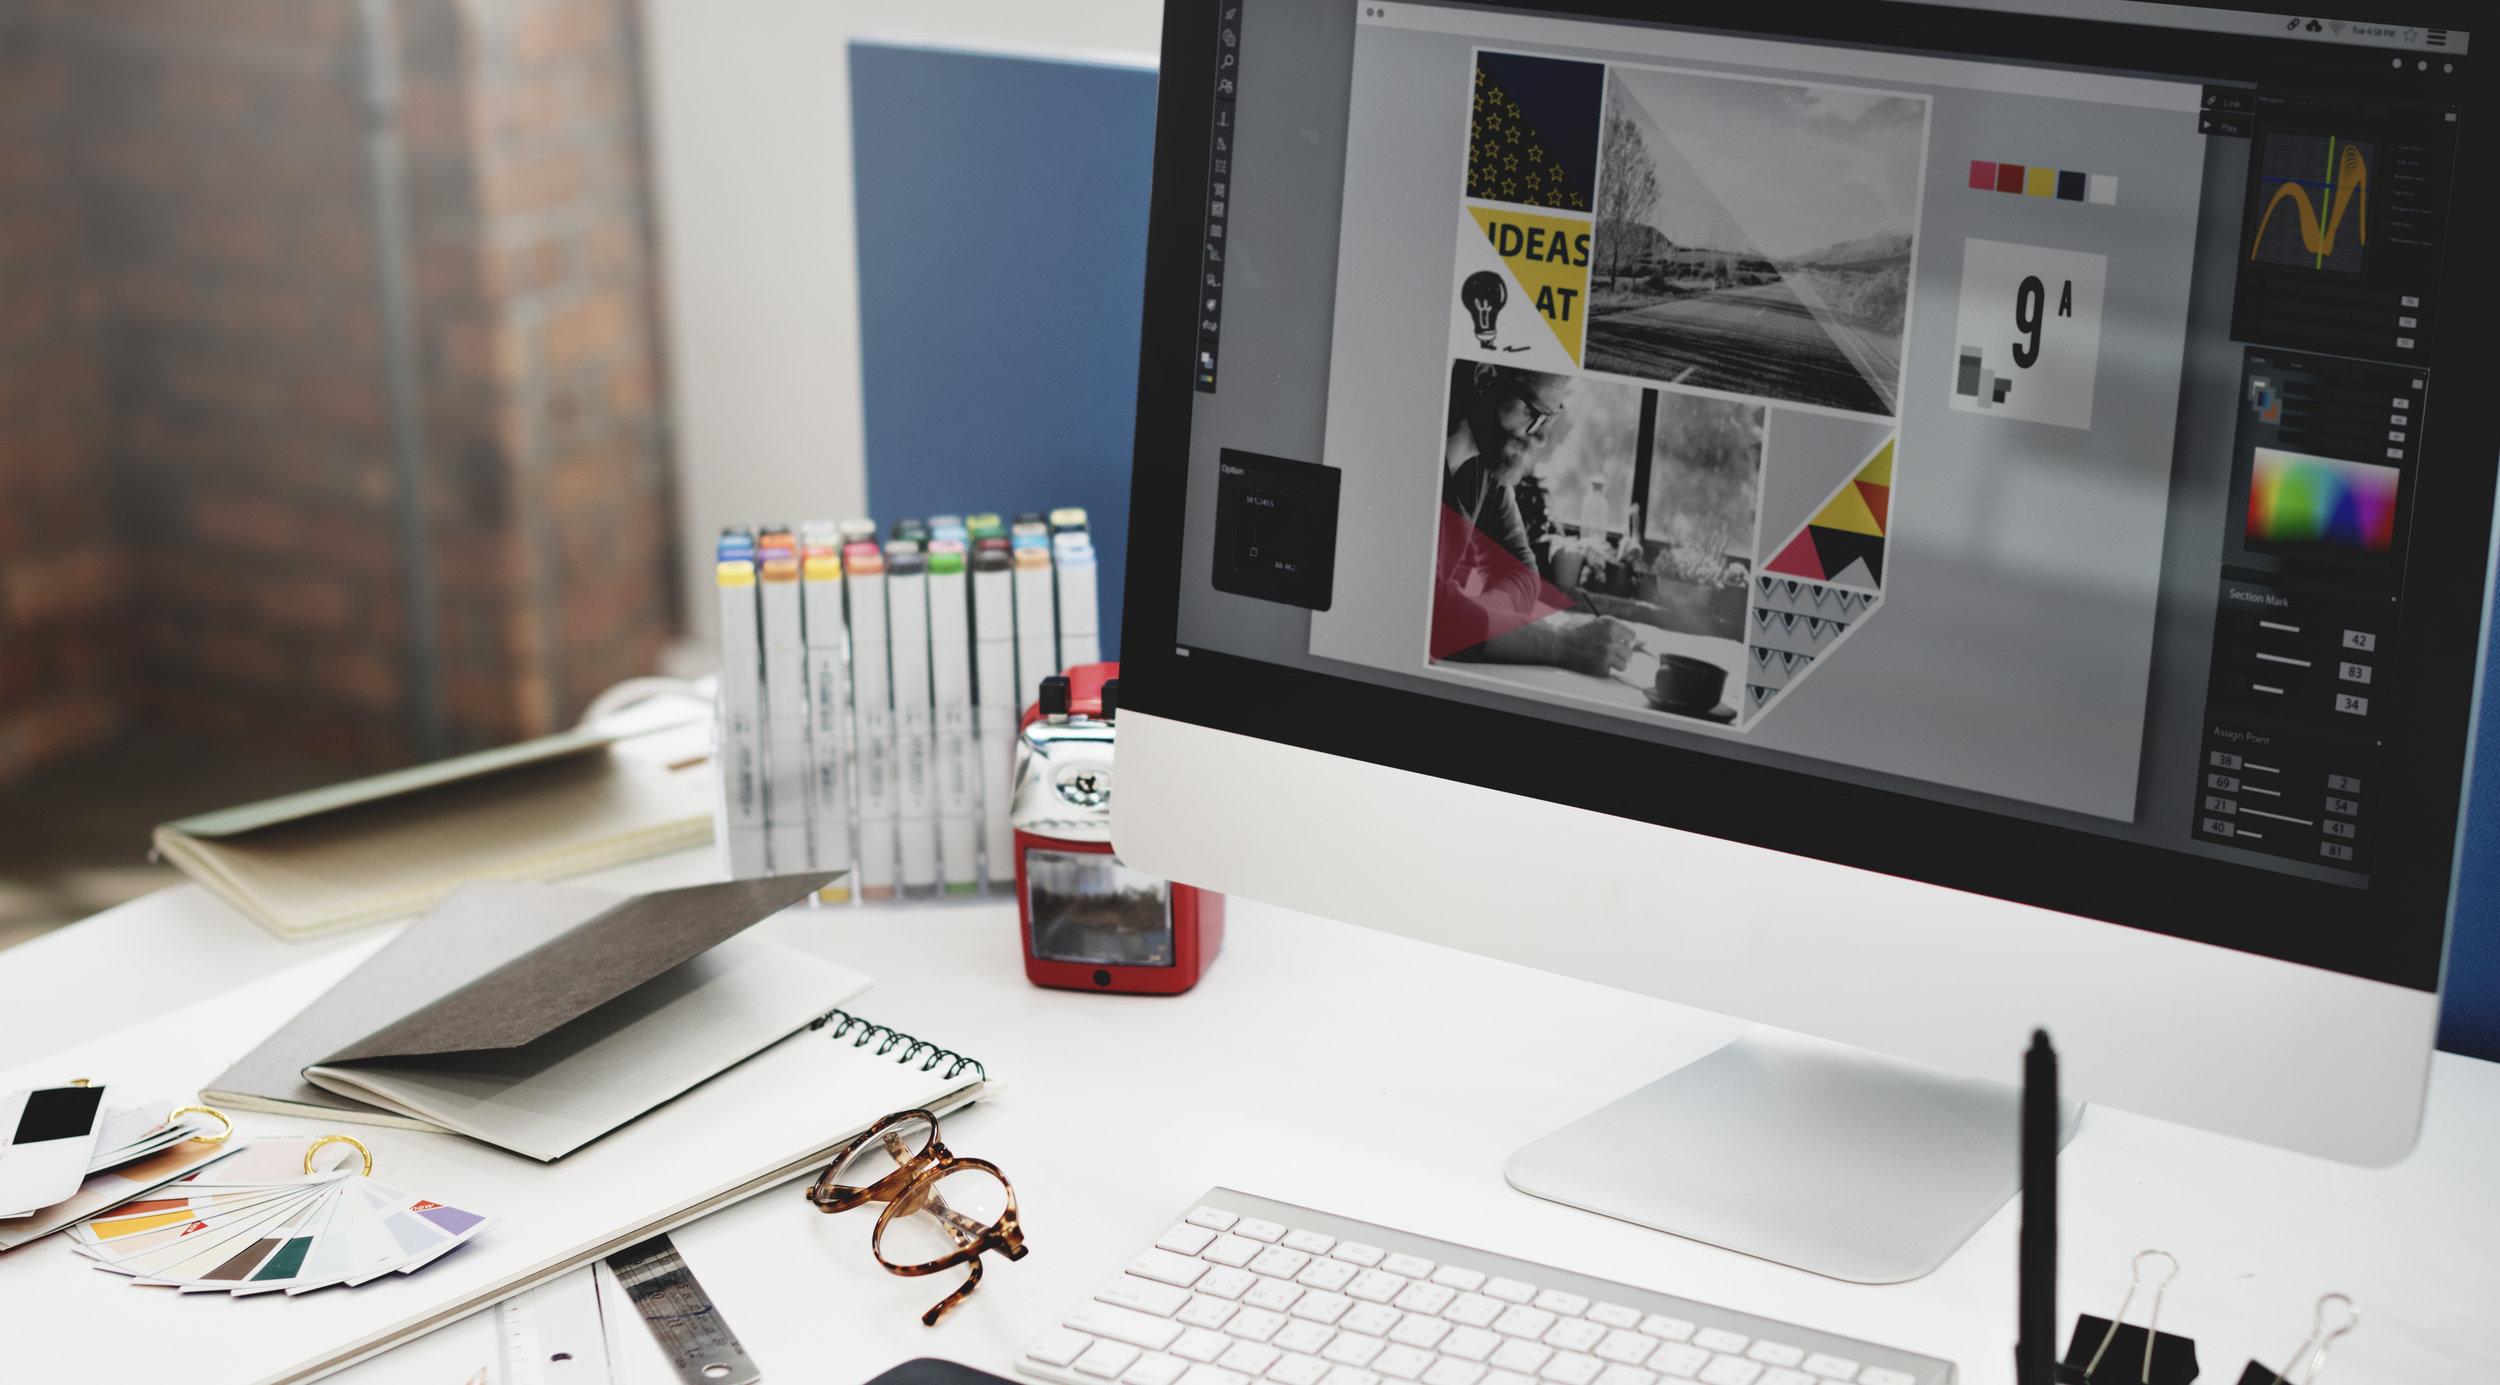 Computer at desk